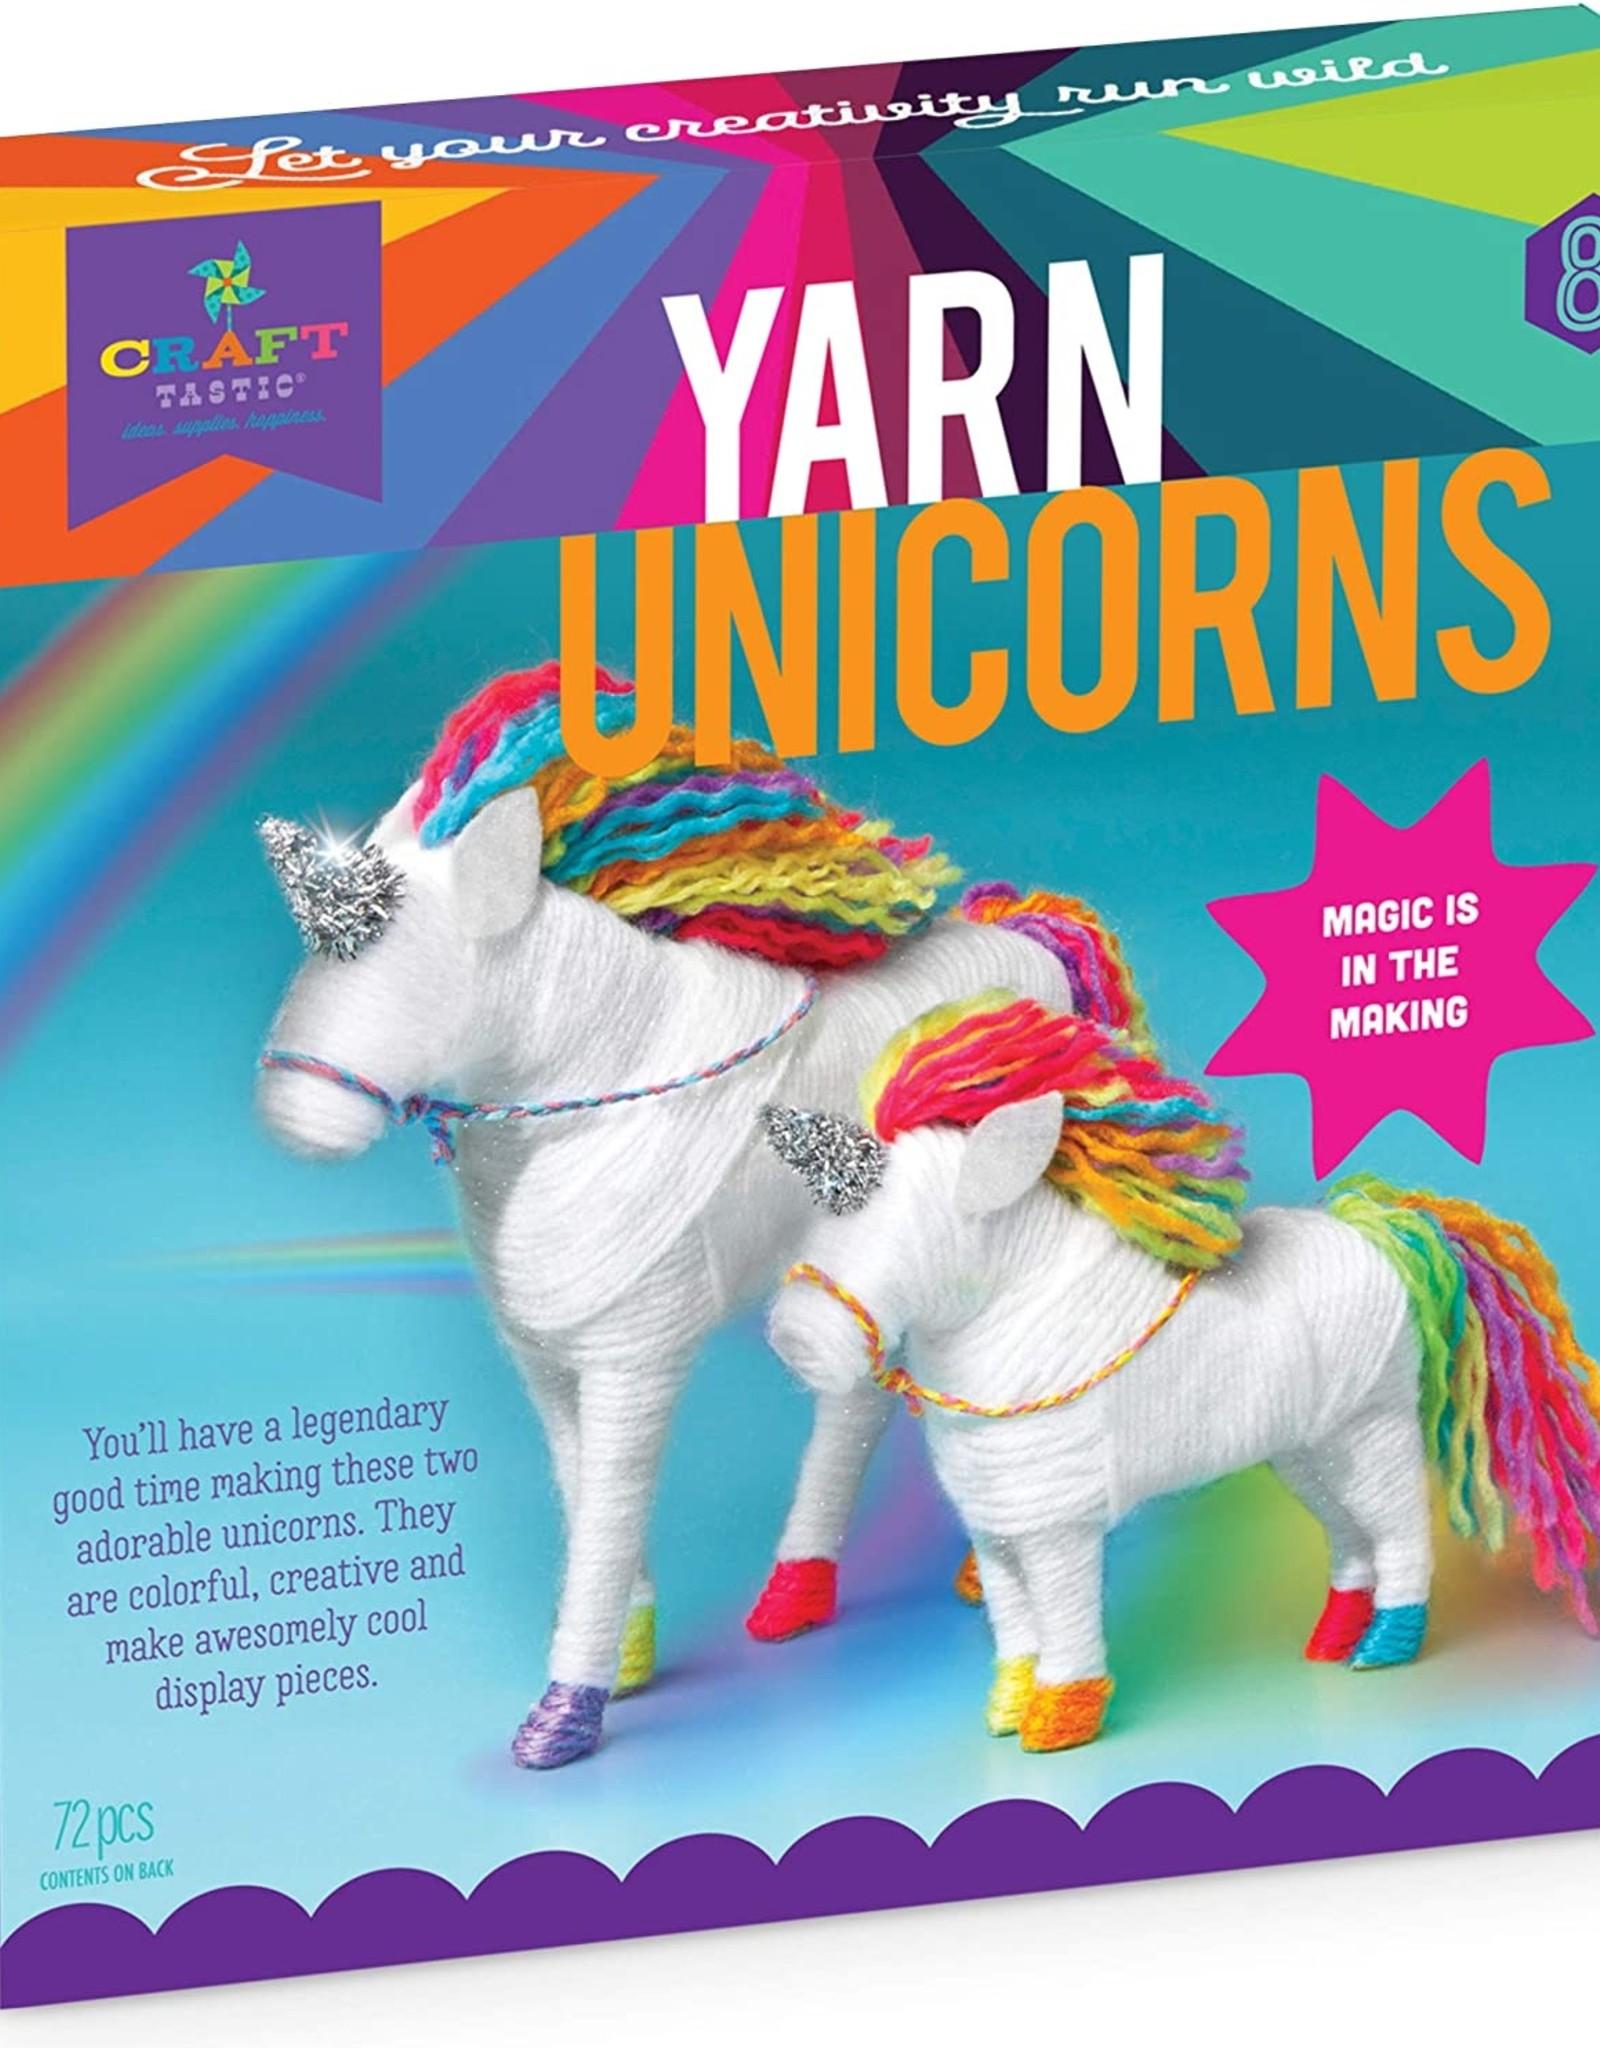 Ann Williams Yarn Unicorn Kit